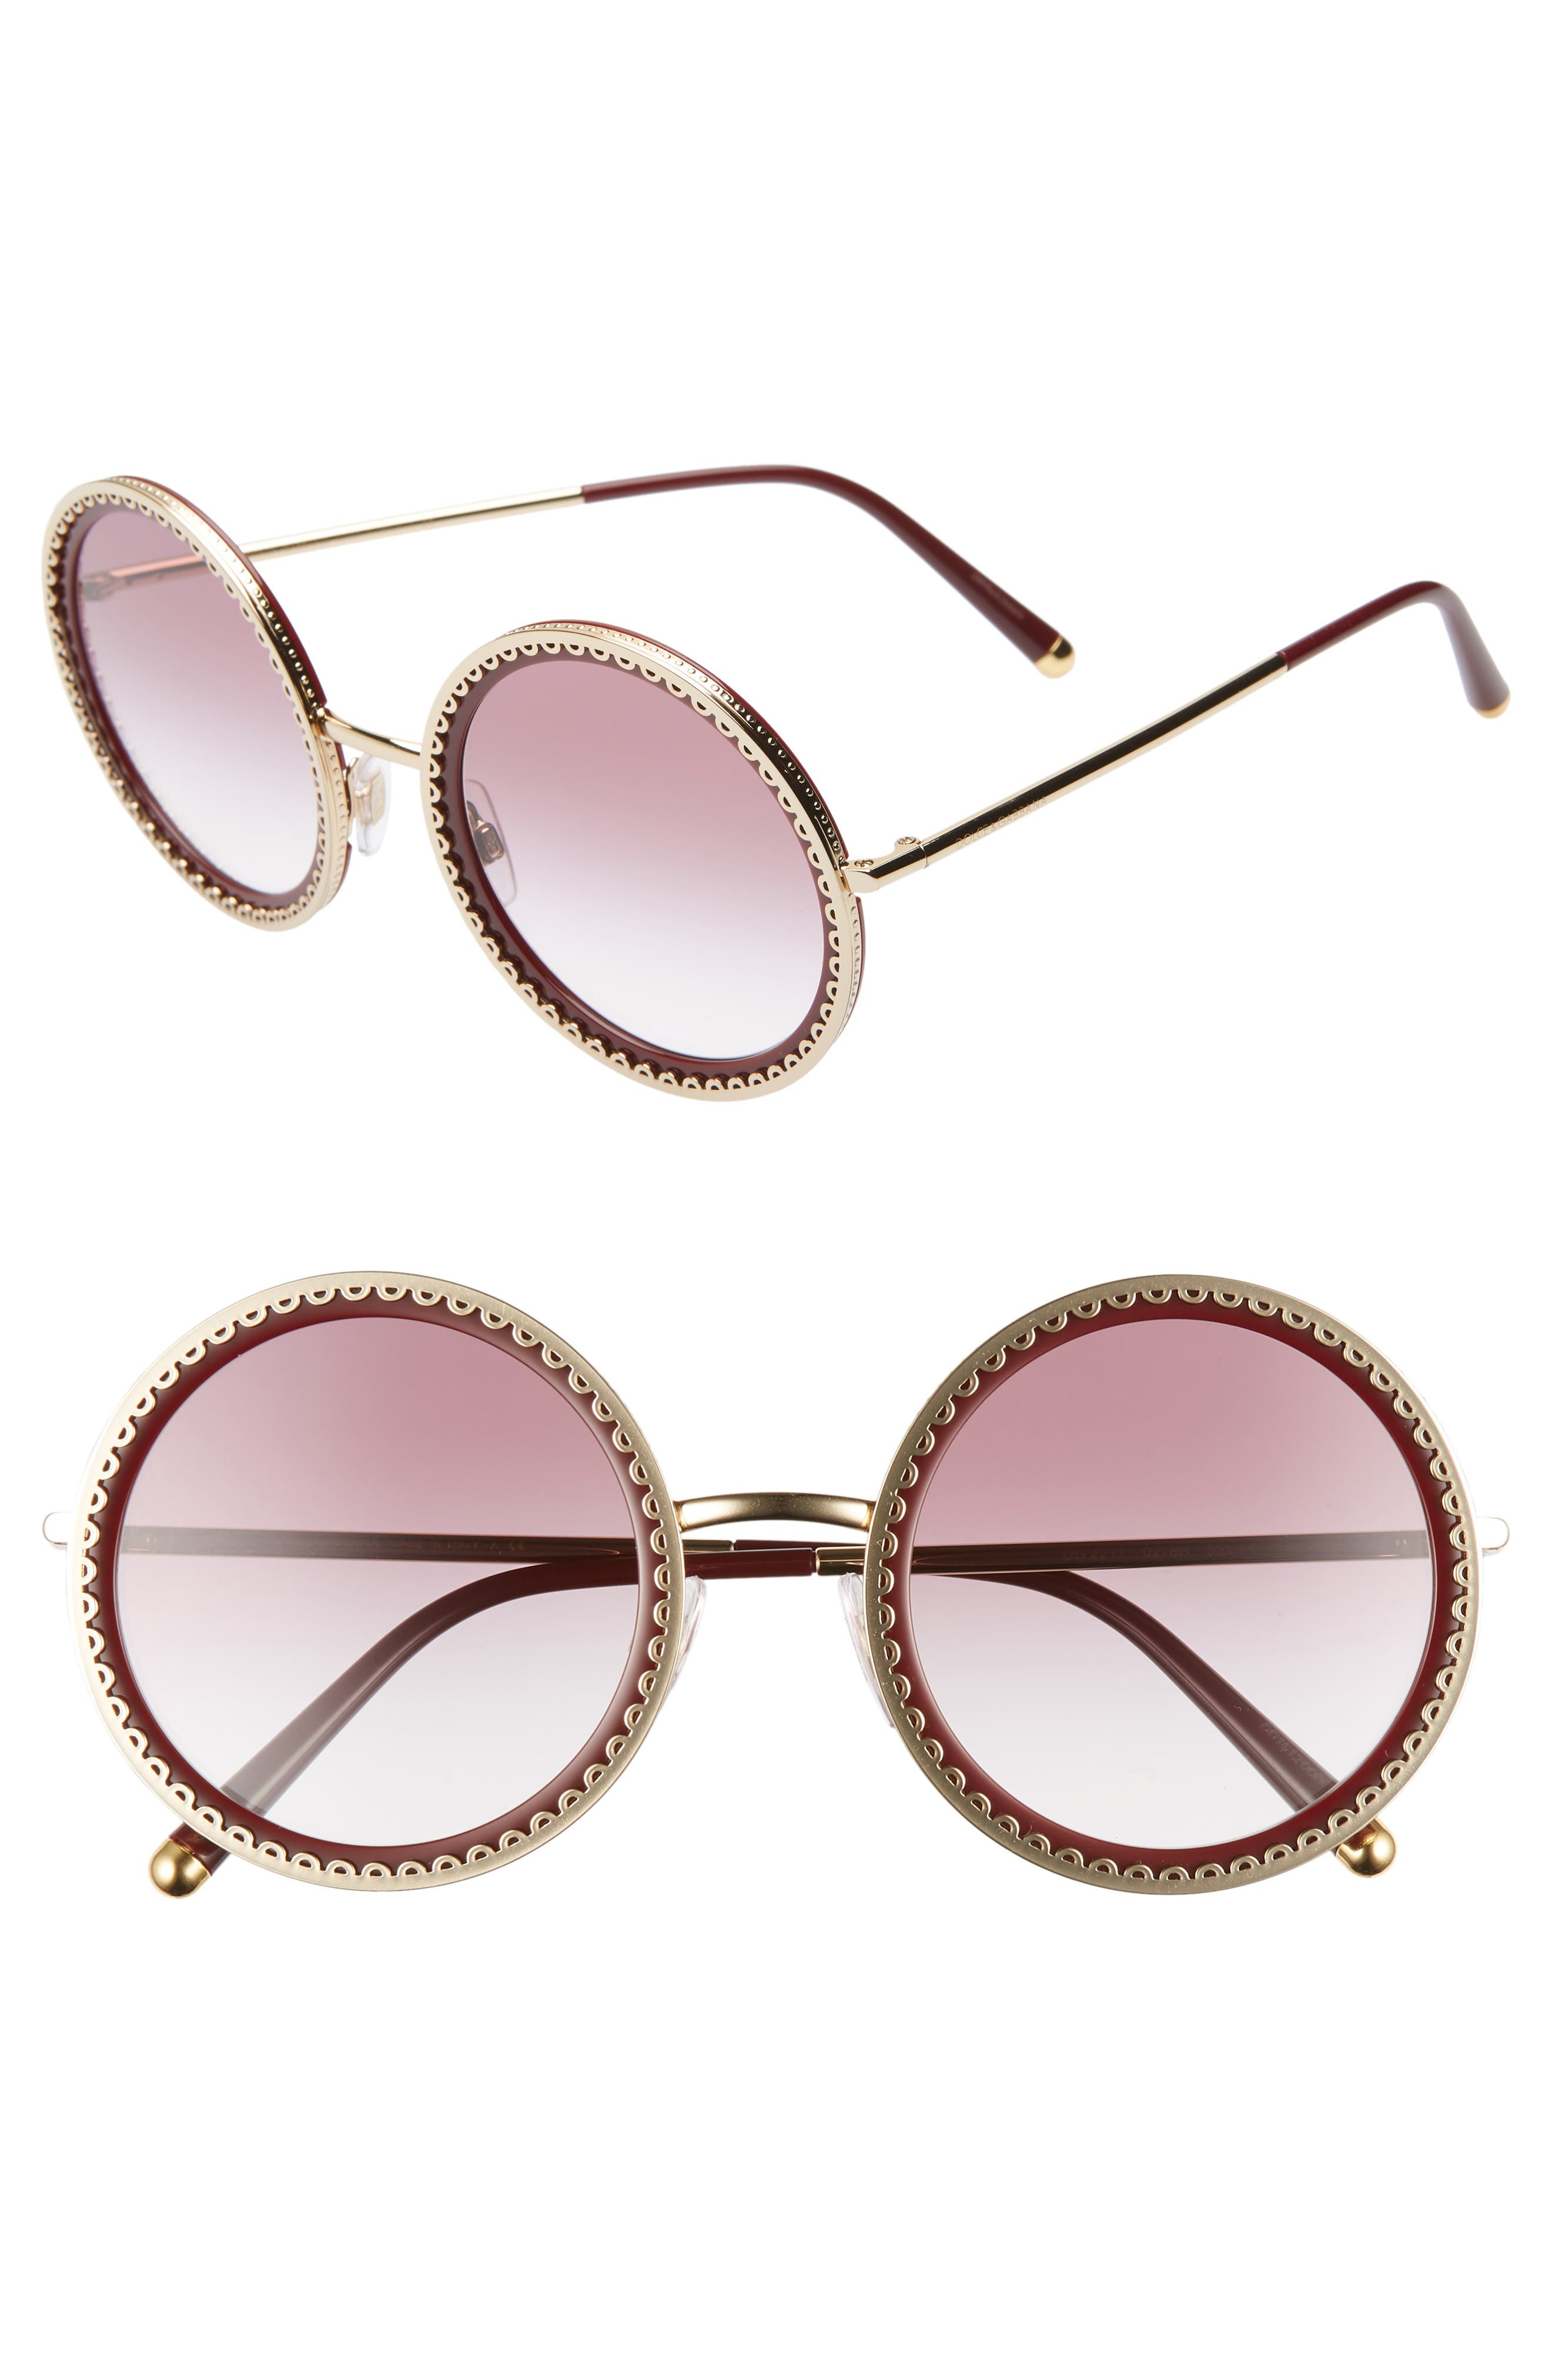 Dolce & gabbana Sacred Heart 5m Gradient Round Sunglasses - Gold Red Gradient